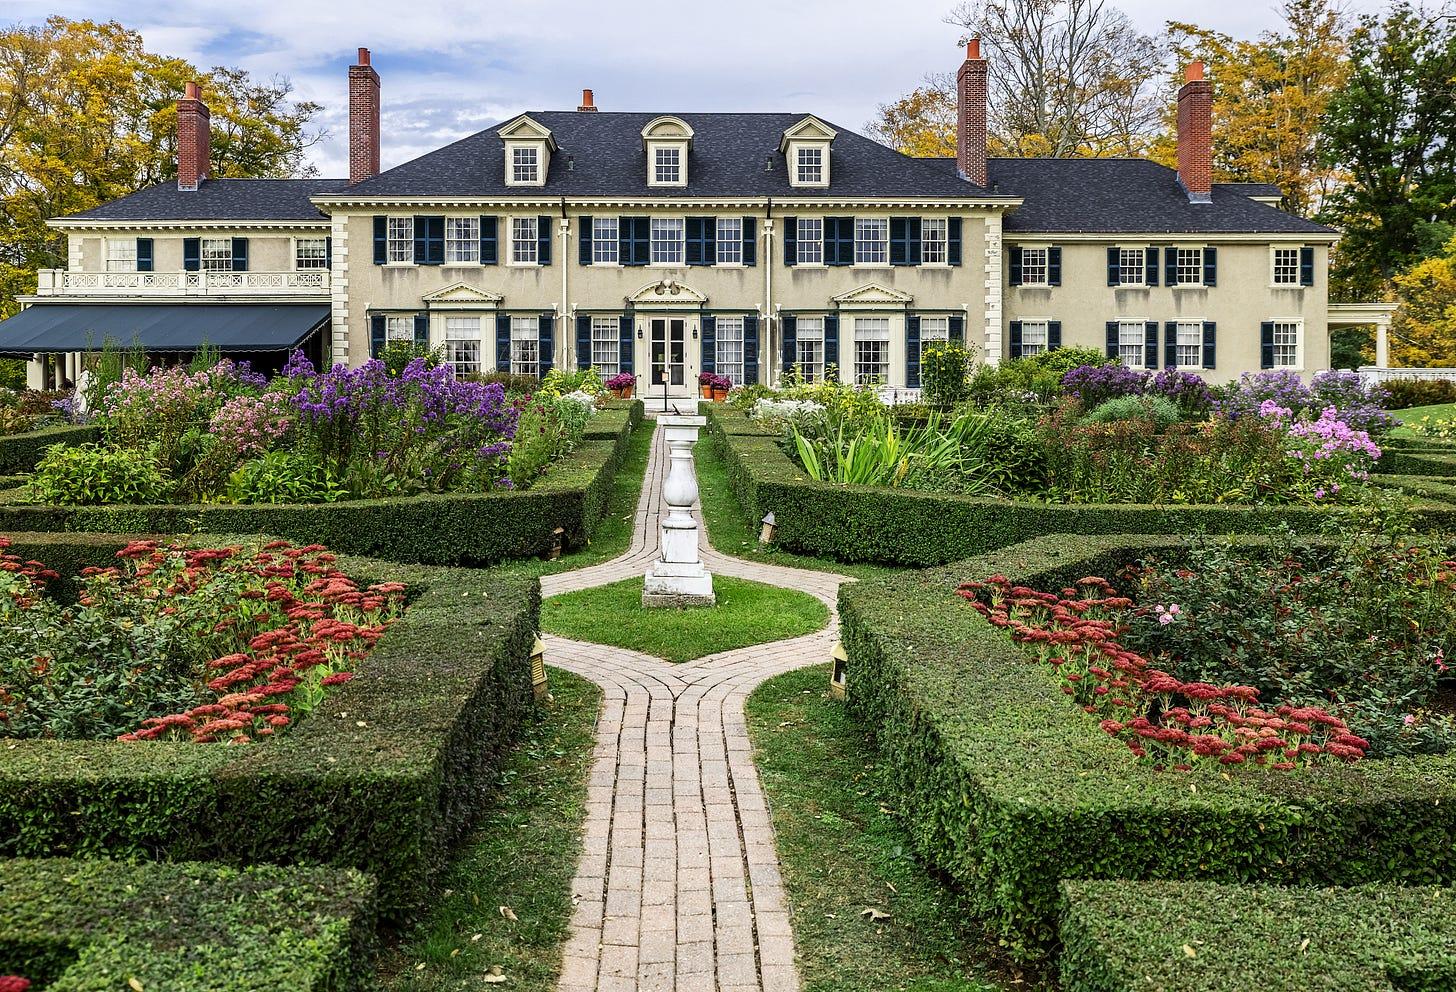 Hildene mansion and formal garden at Manchester in Vermont.